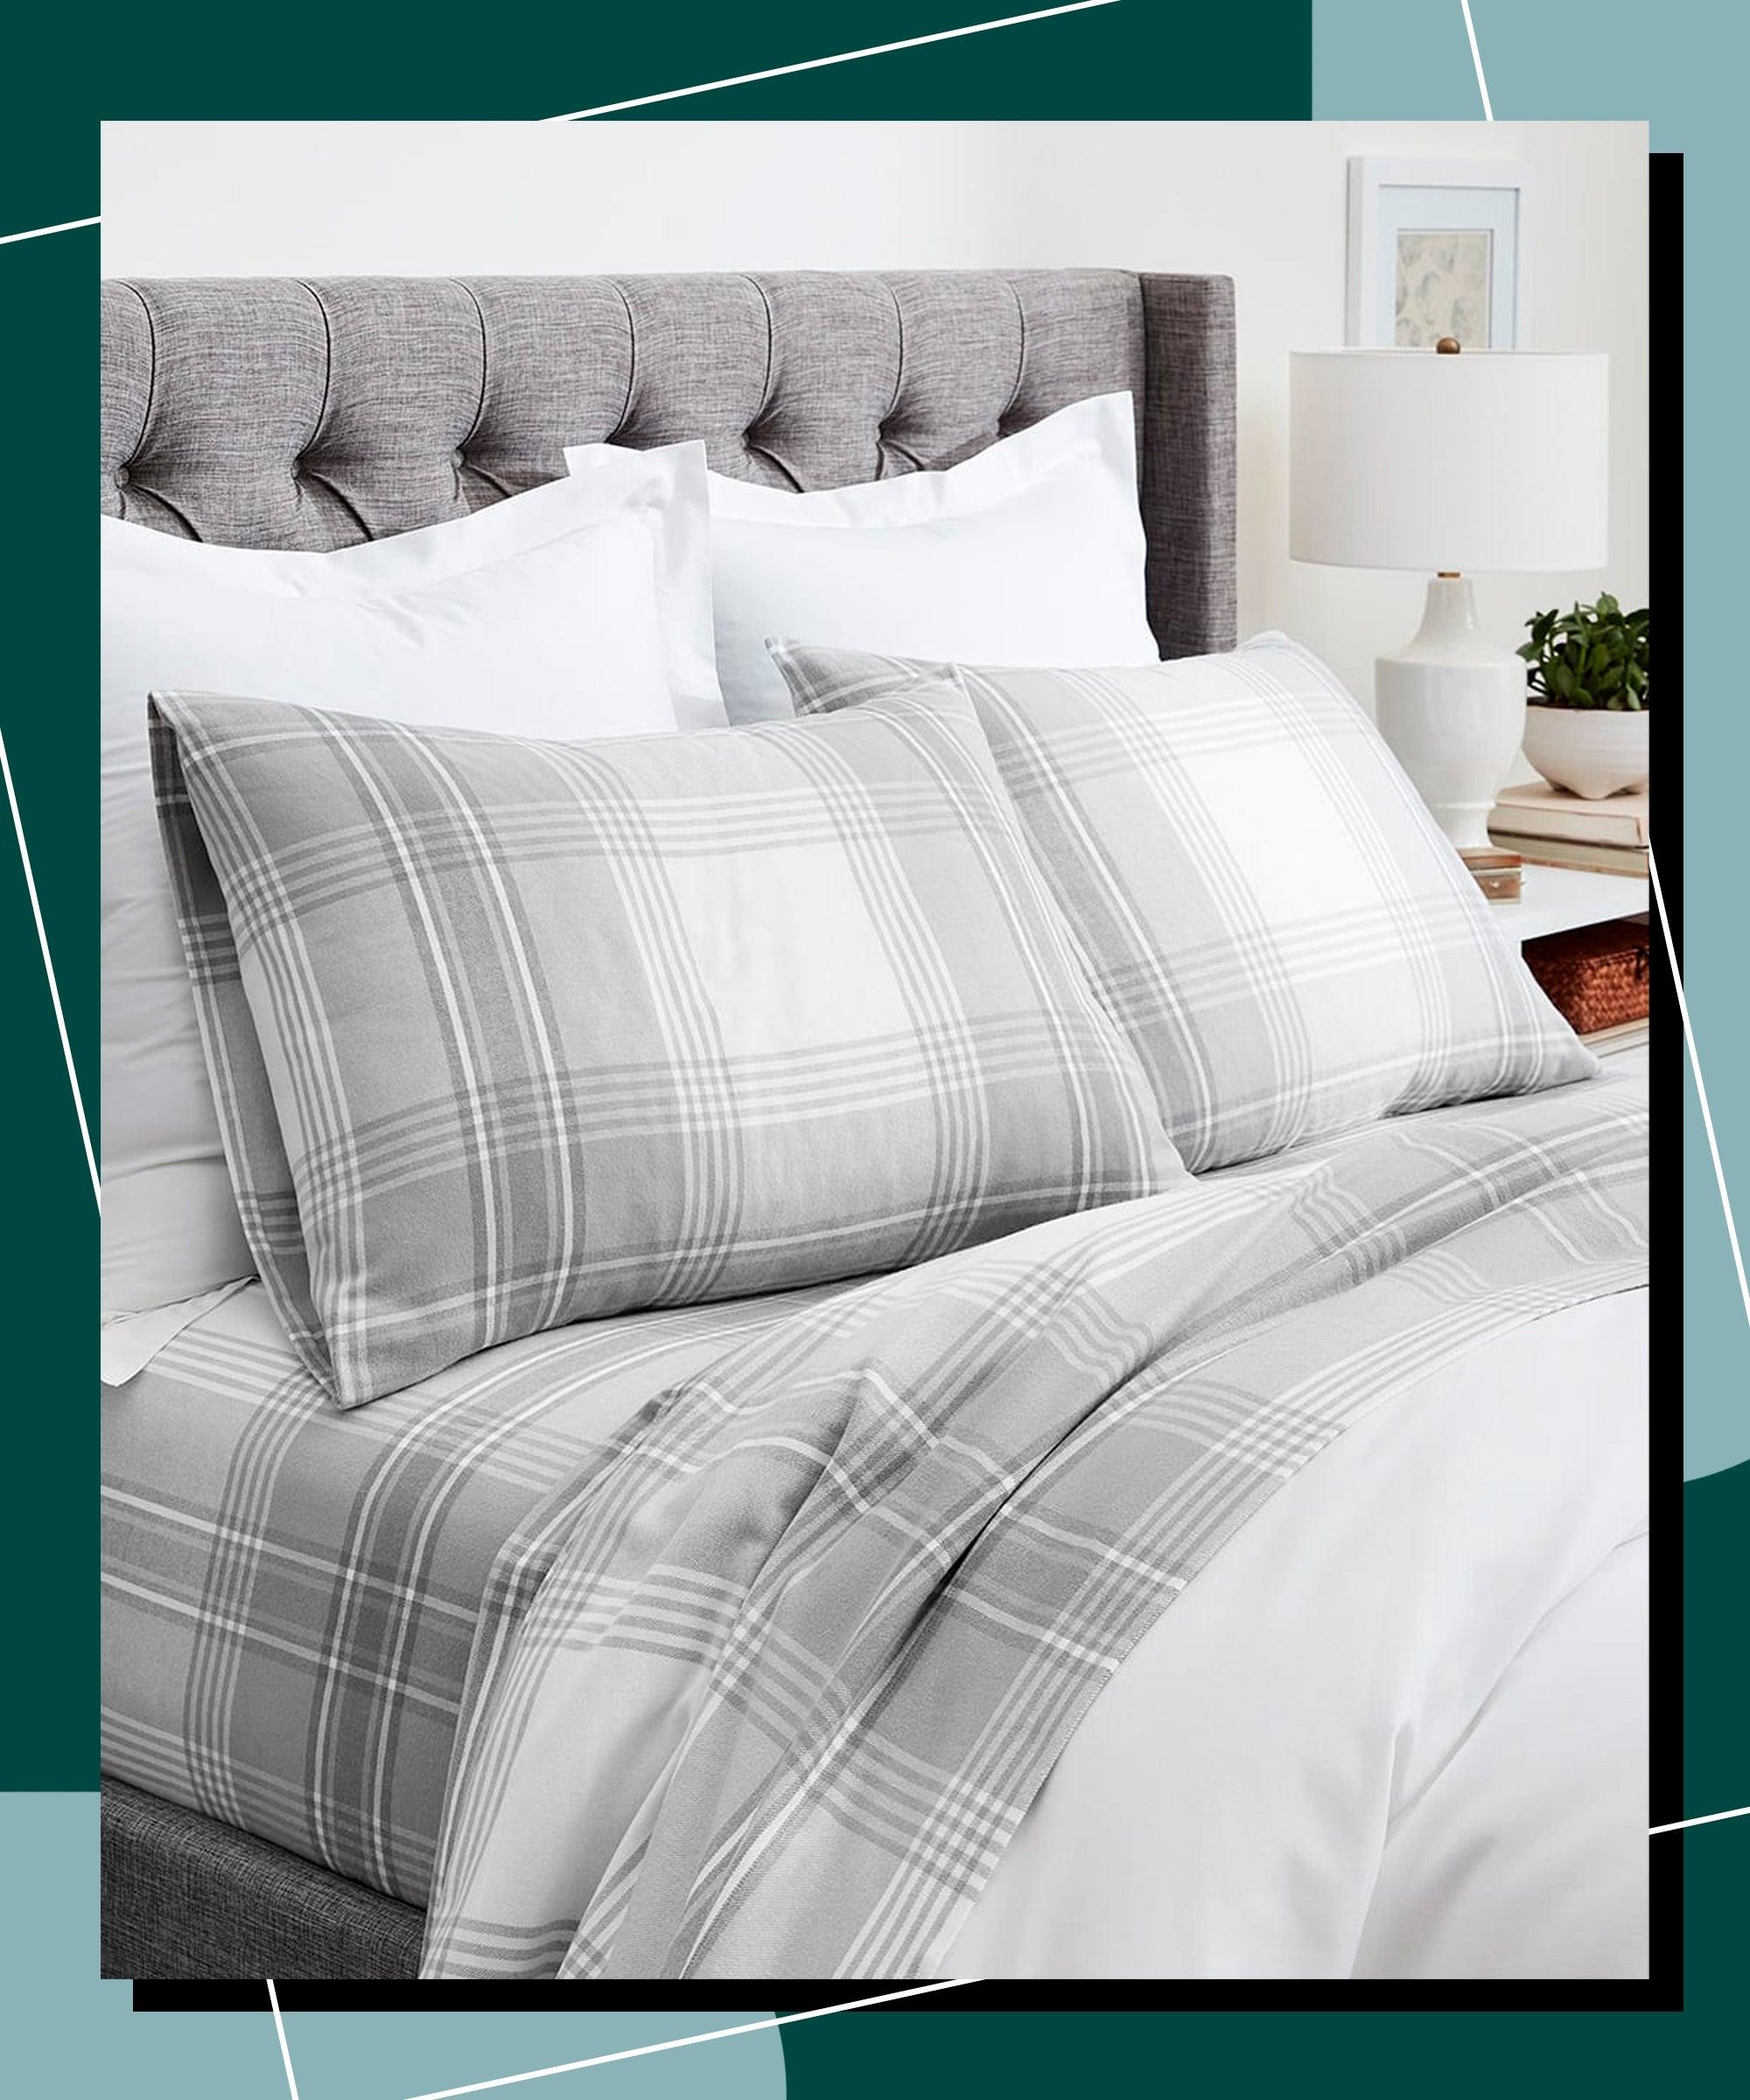 Soft Flannel Sheet Sets Best Winter Bedding 2020